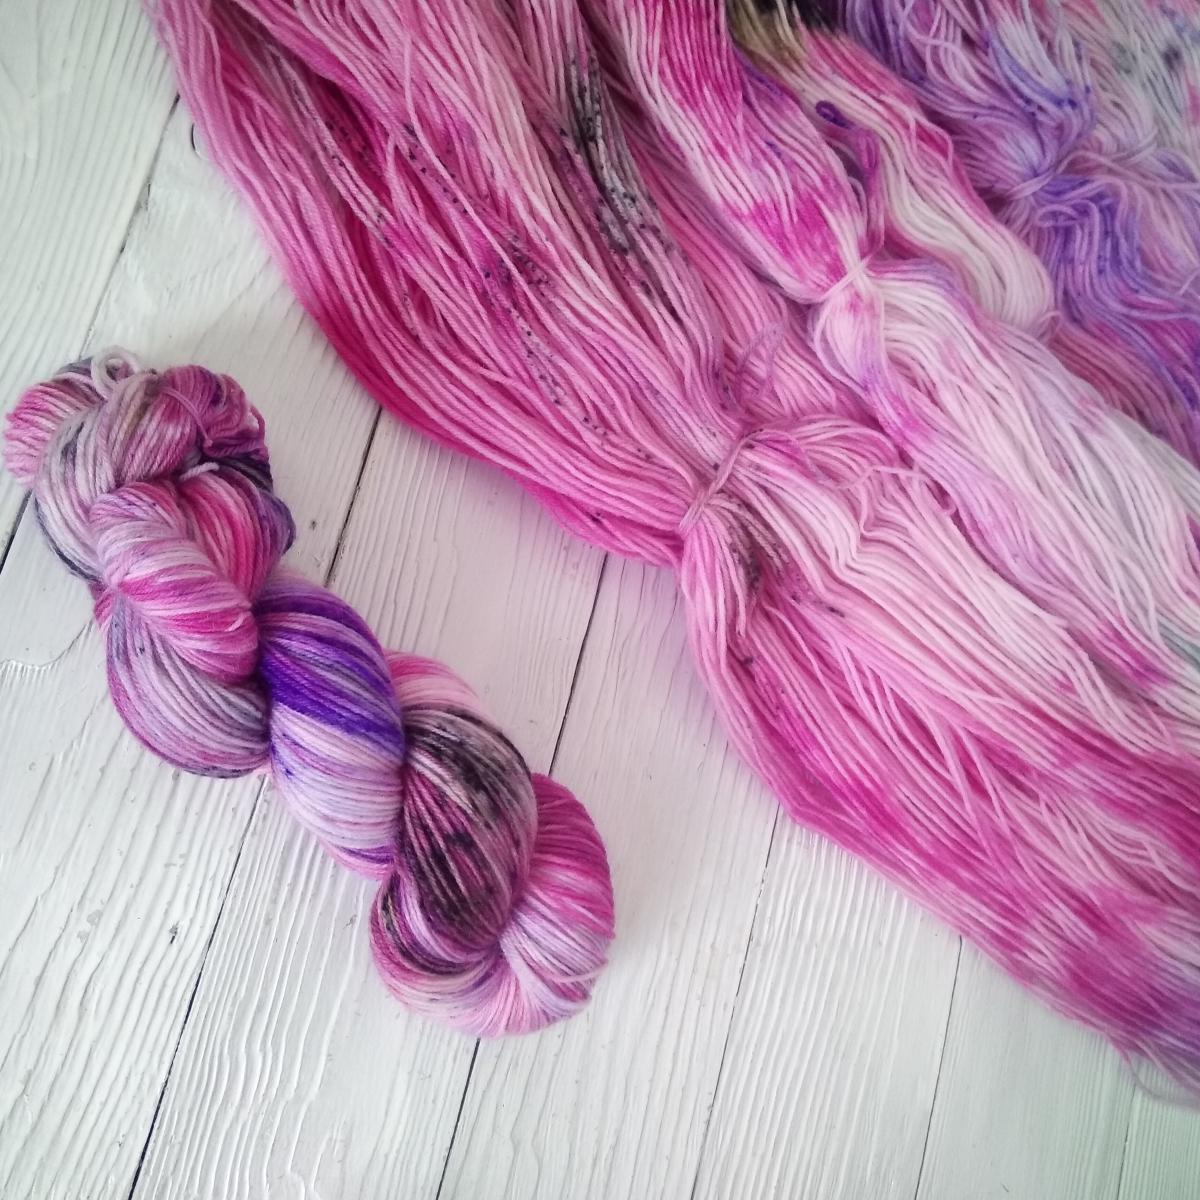 woodico.pro hand dyed yarn 041 5 1200x1200 - Hand dyed yarn / 041